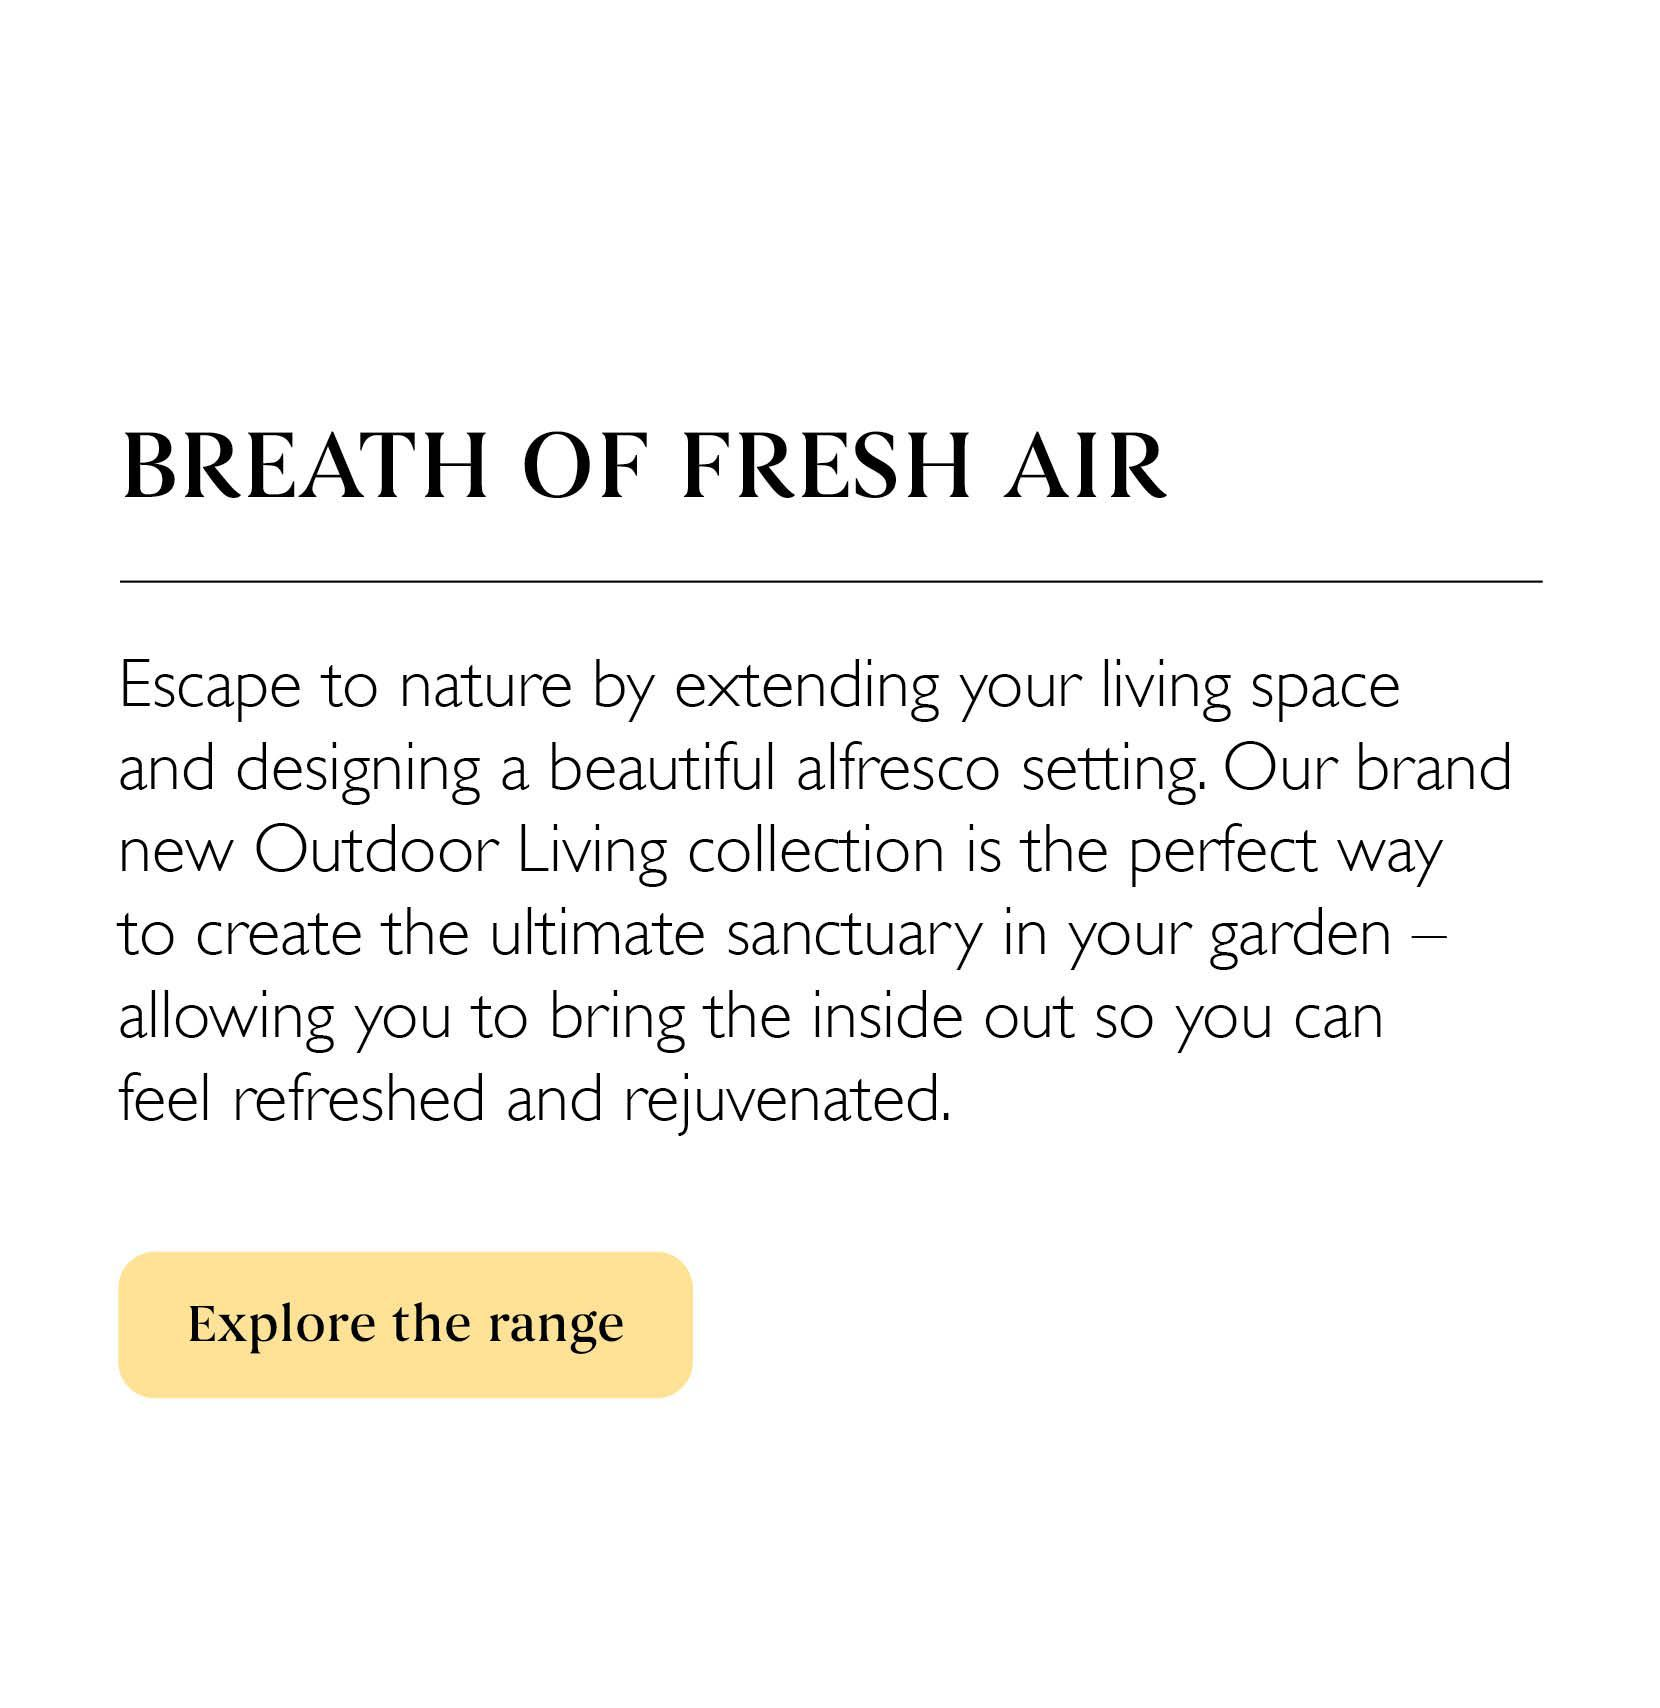 New outdoor living garden furniture designed for alfresco living